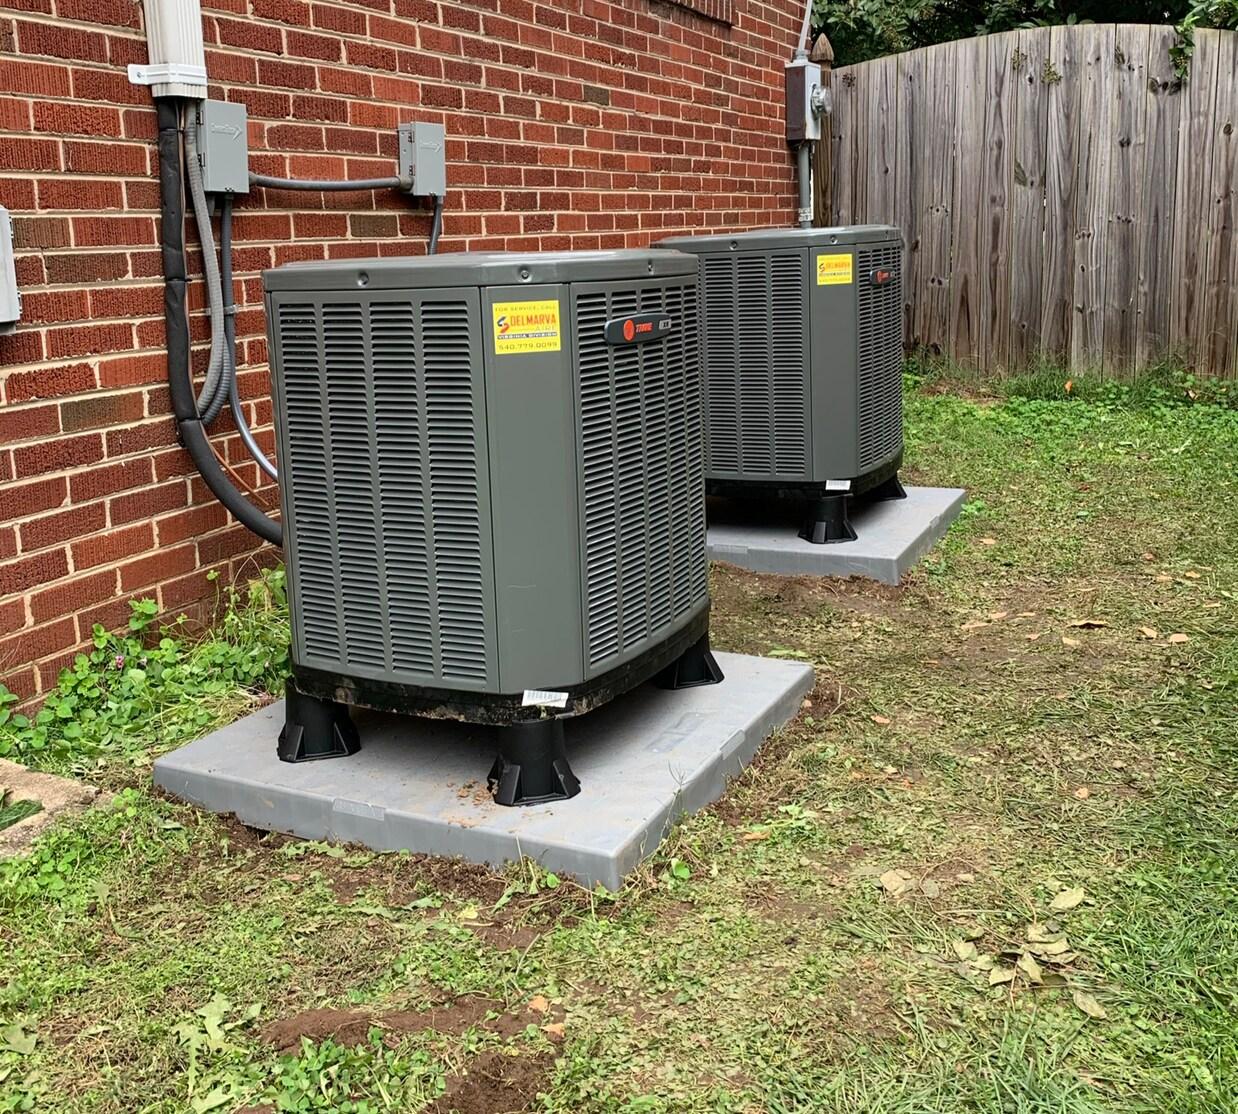 22401 Split Heat Pump Replacements